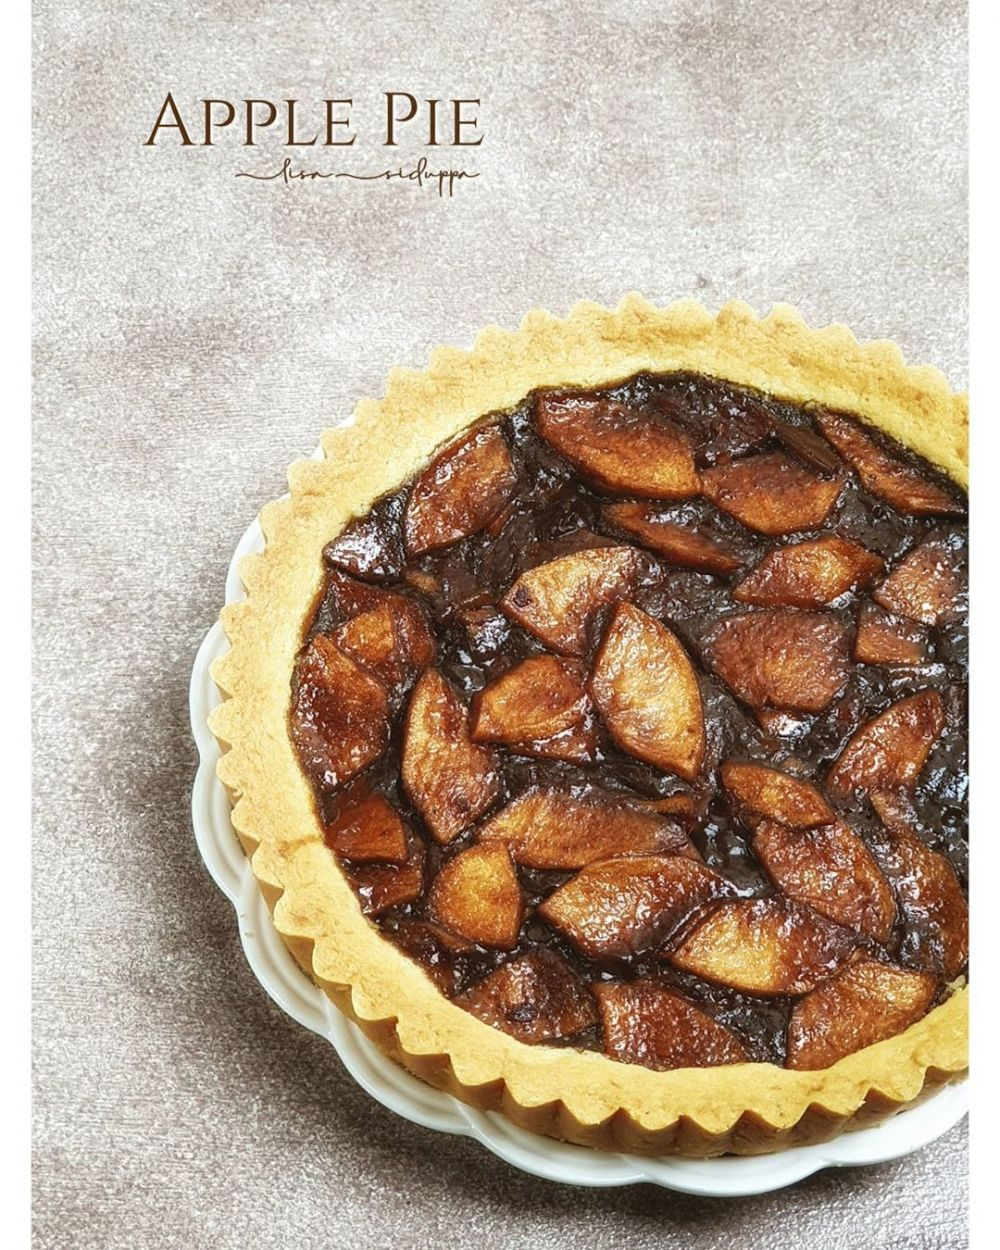 Resep Apple Pie Instagram Pie Apel Pai Saus Apel